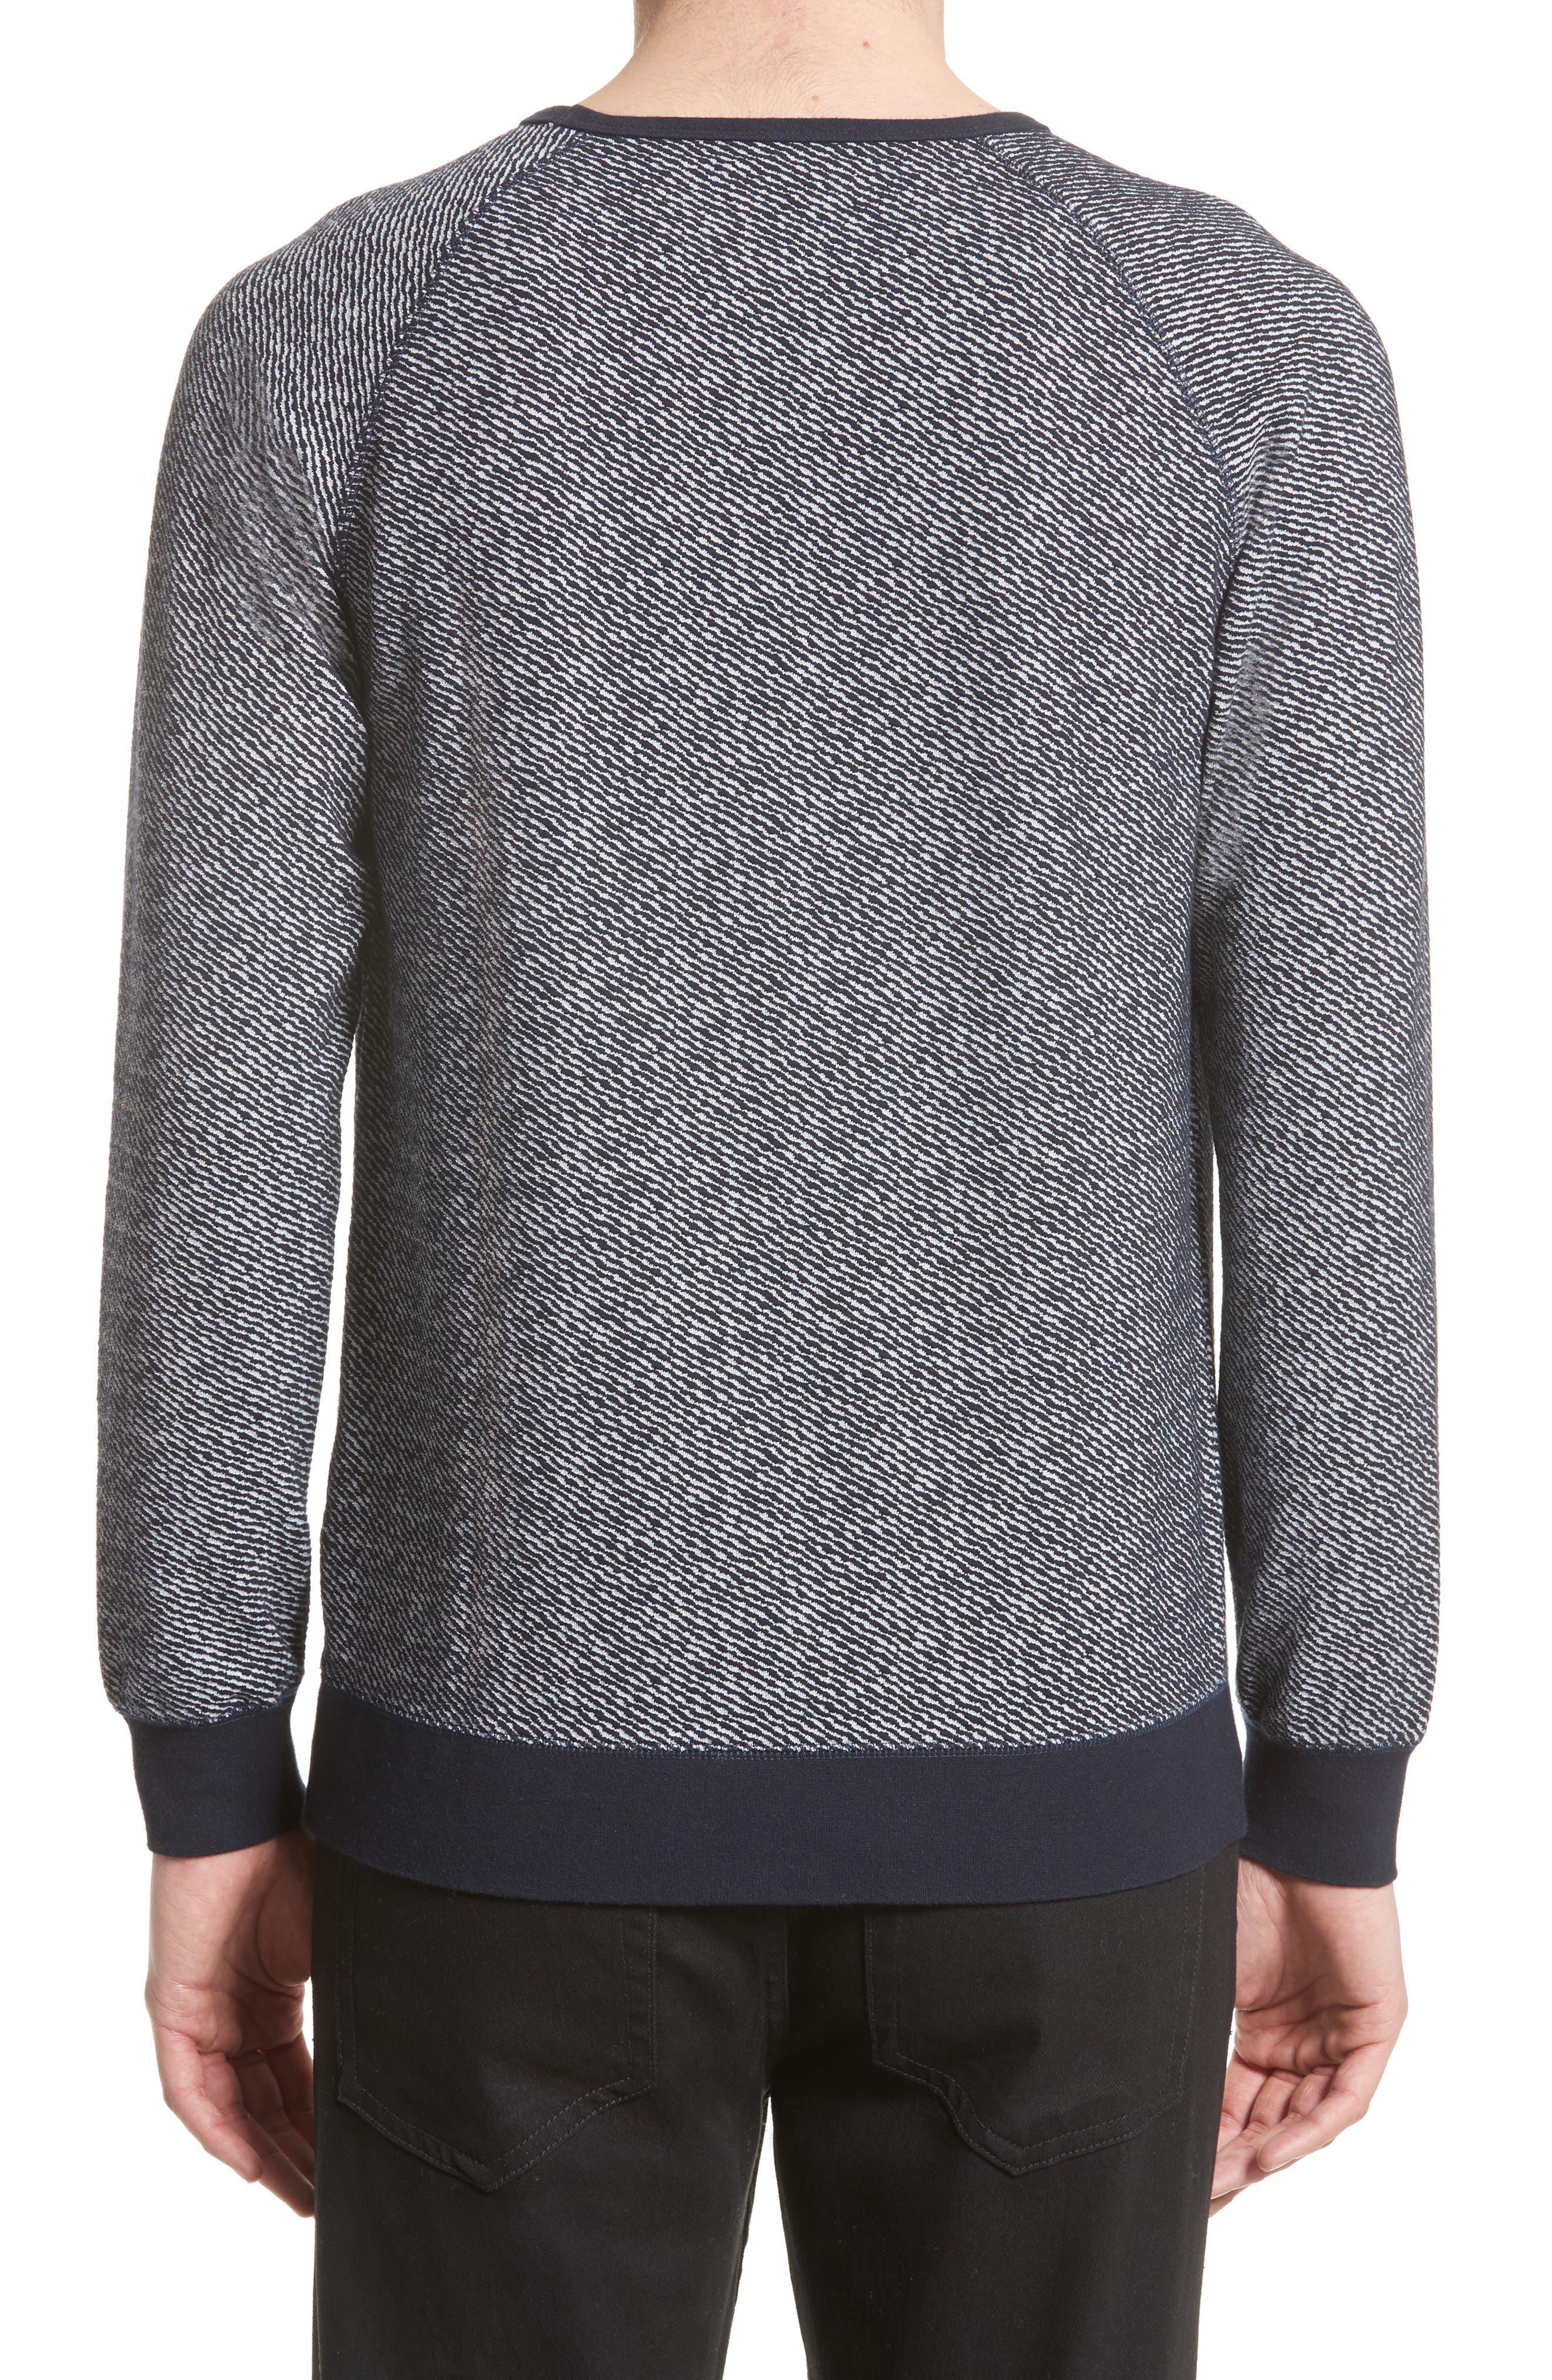 Kasu Sweater,                             Alternate thumbnail 4, color,